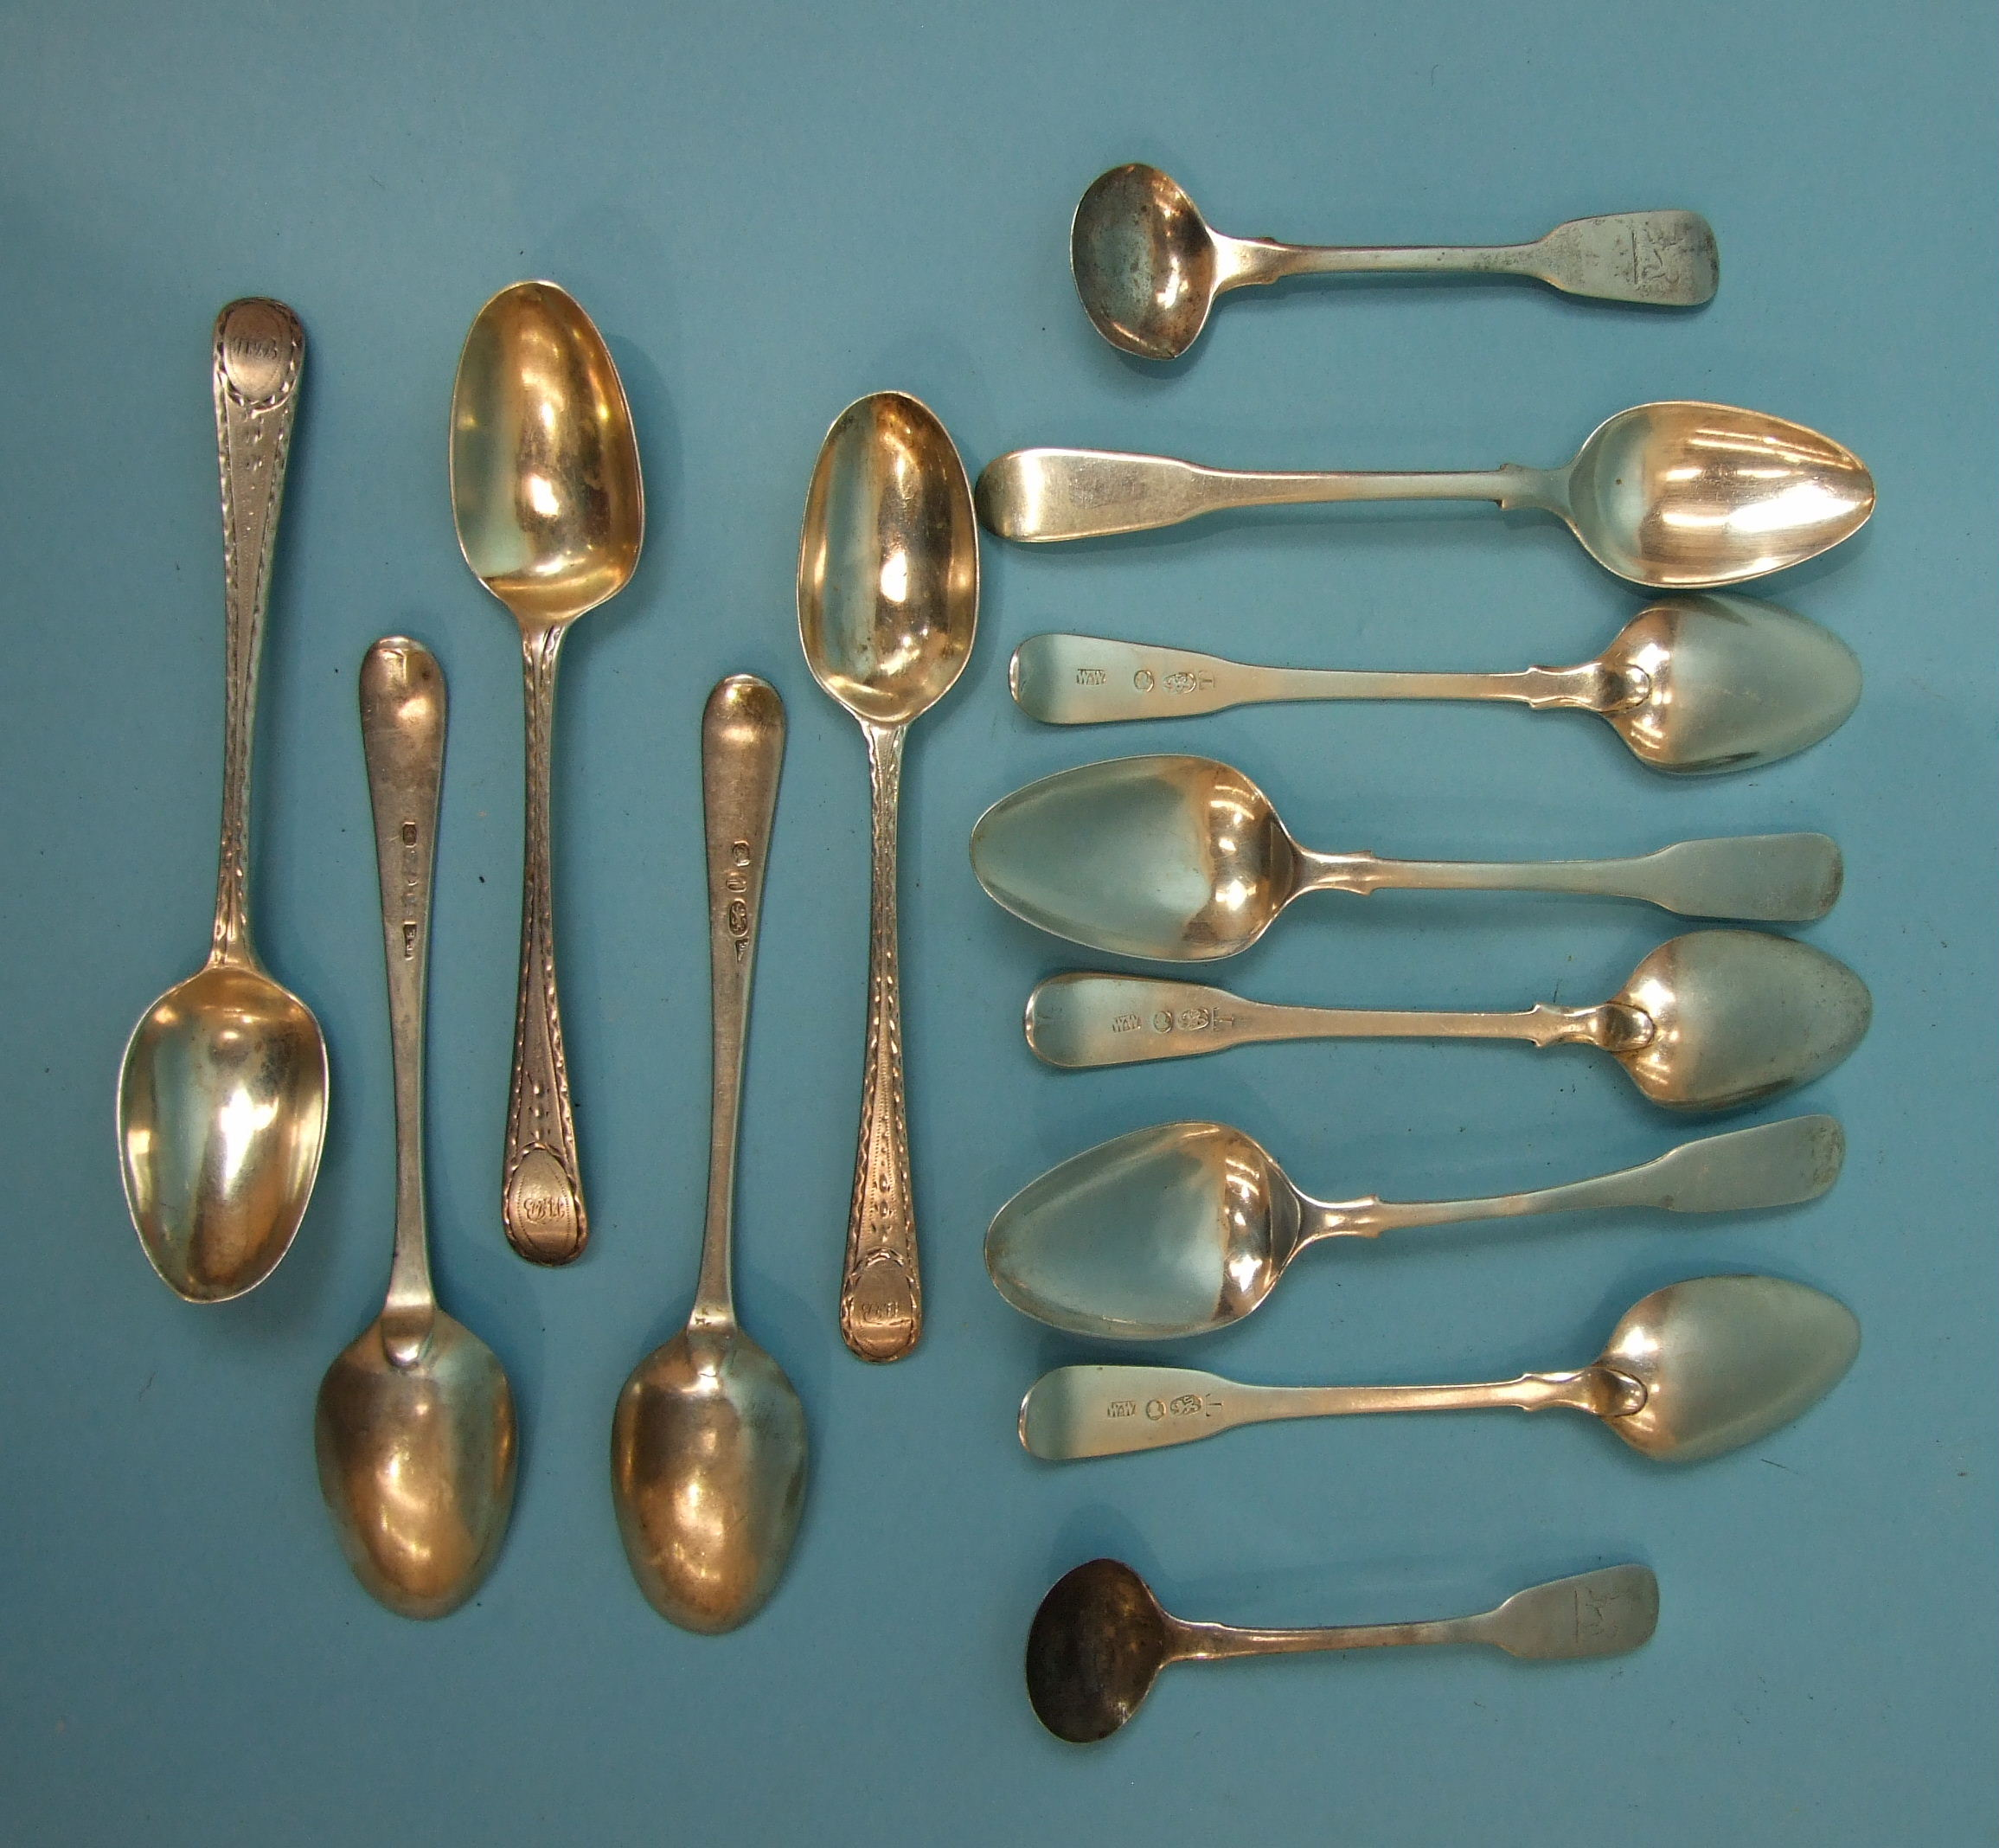 Lot 332 - A set of Georgian teaspoons, maker WW, five 18th century bright-cut teaspoons, London 1784 and a